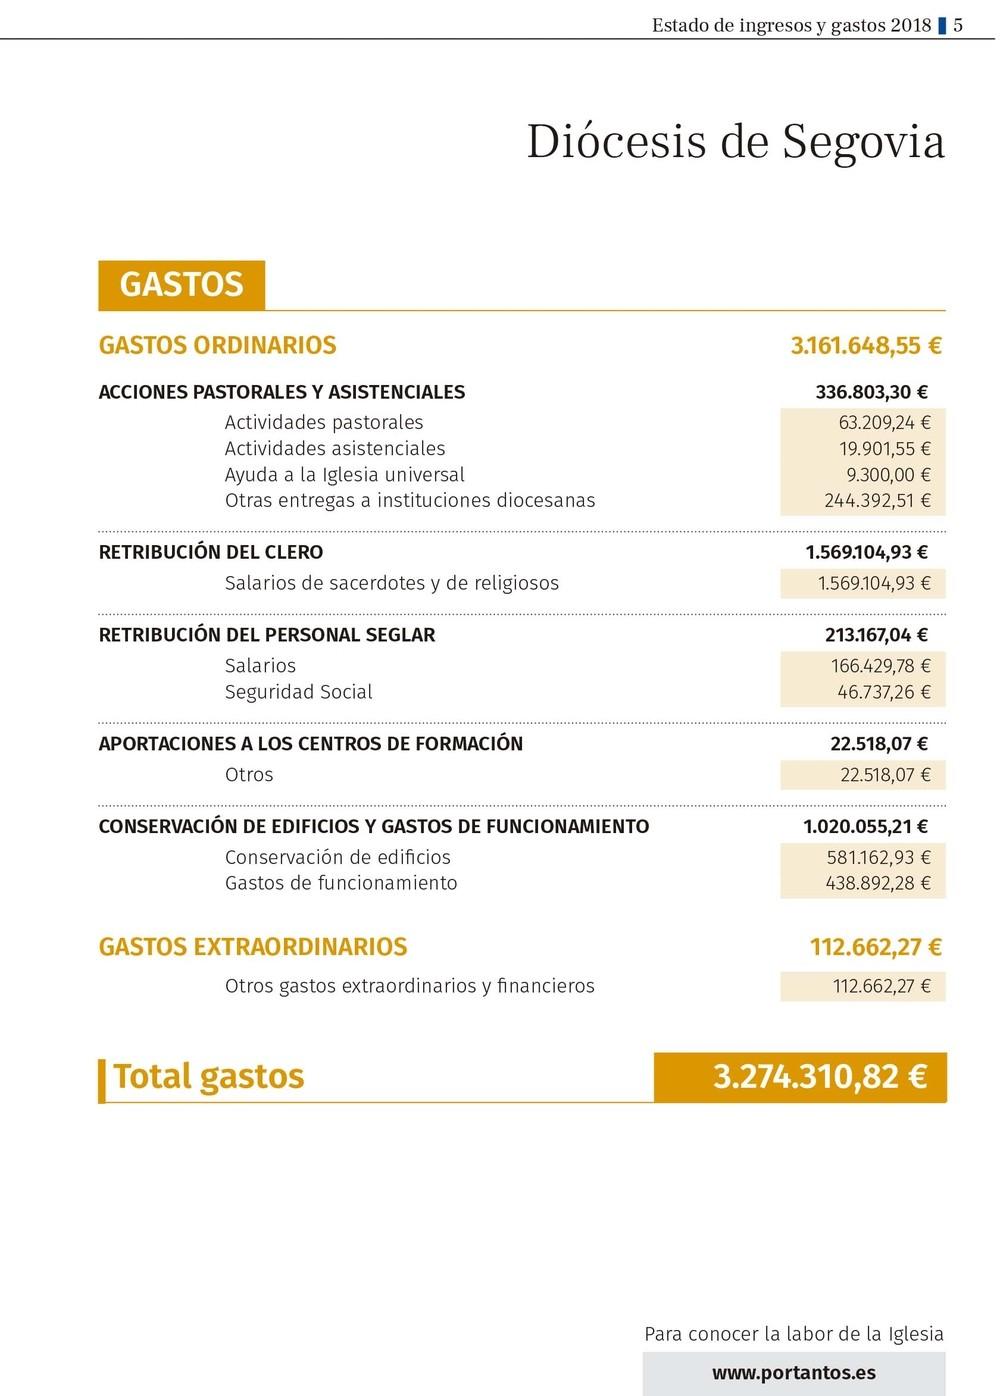 La Iglesia gastó en 2018  en Segovia 3,2 millones de euros